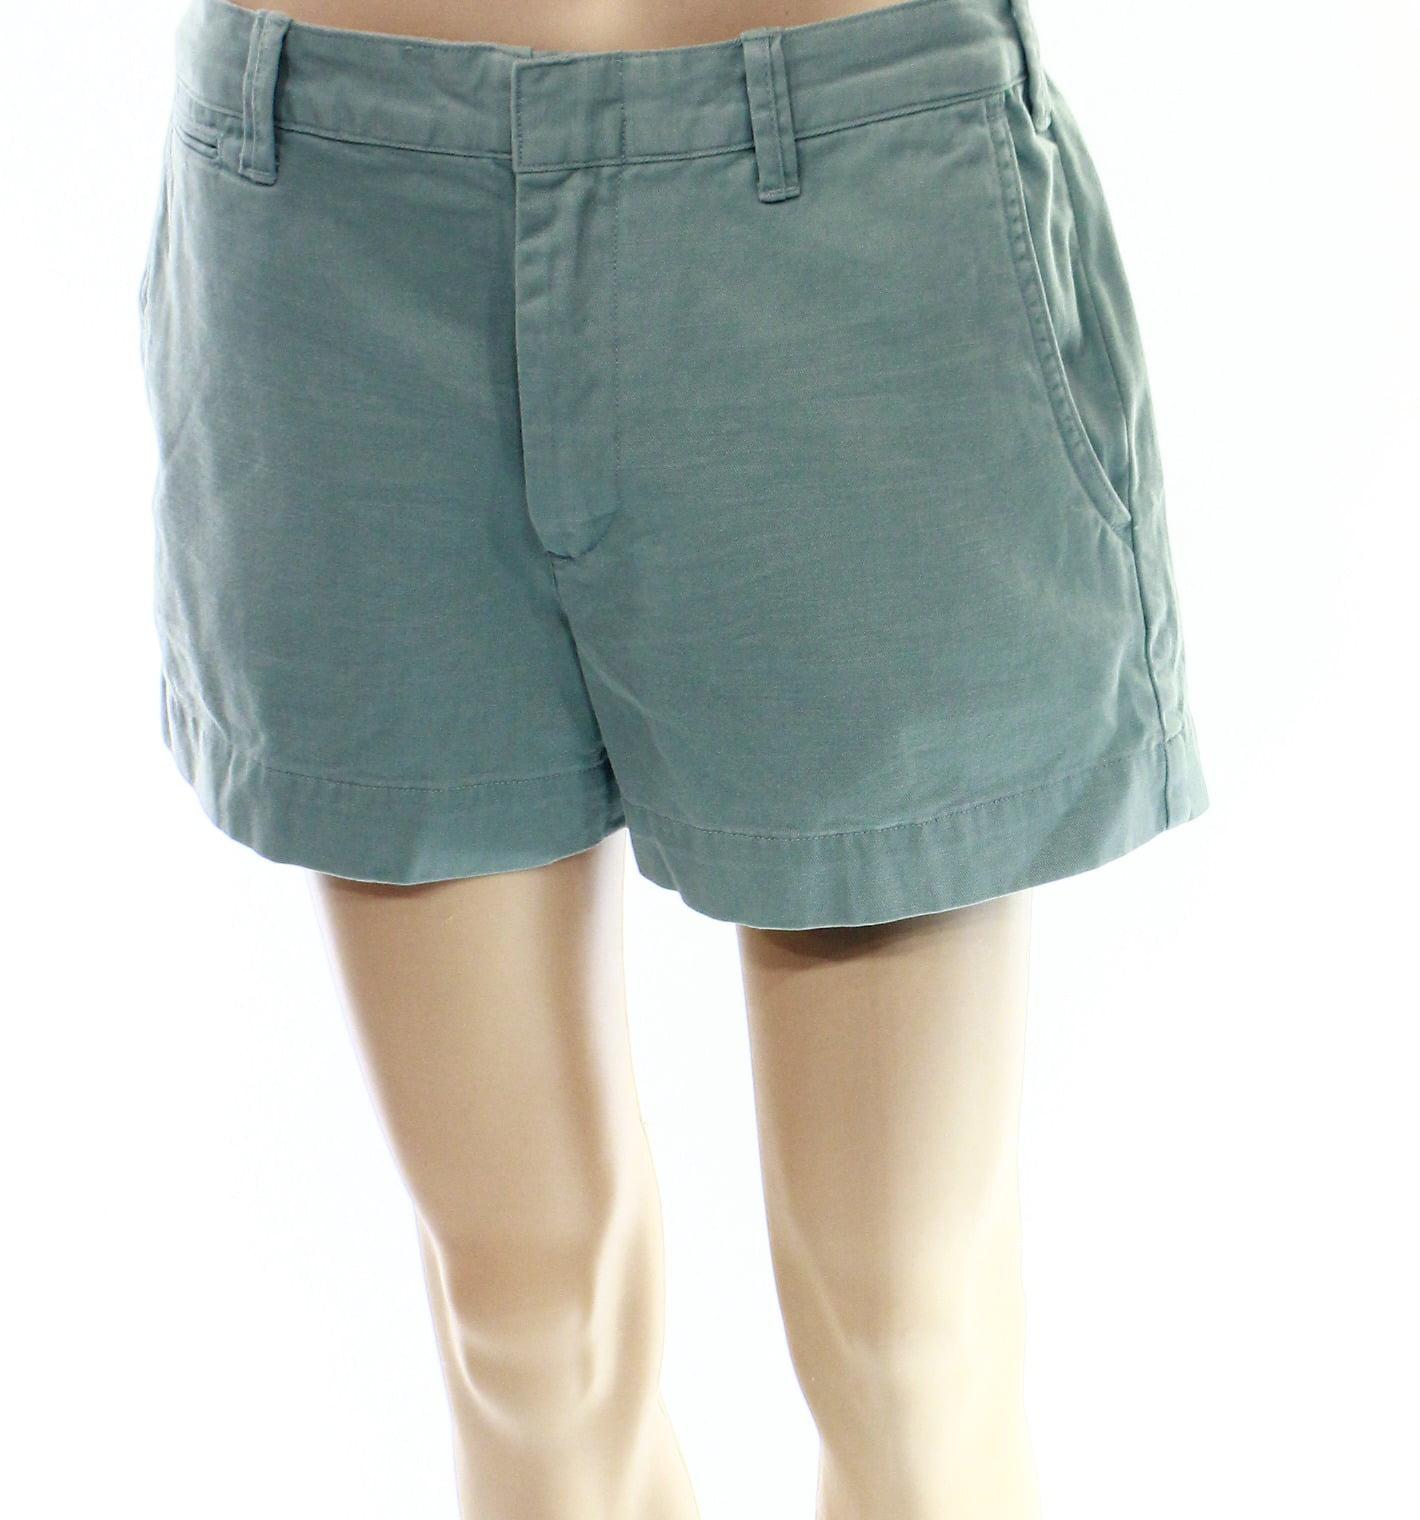 "W 28/"" POLO RALPH LAUREN Men/'s Chino Shorts Grass Green"